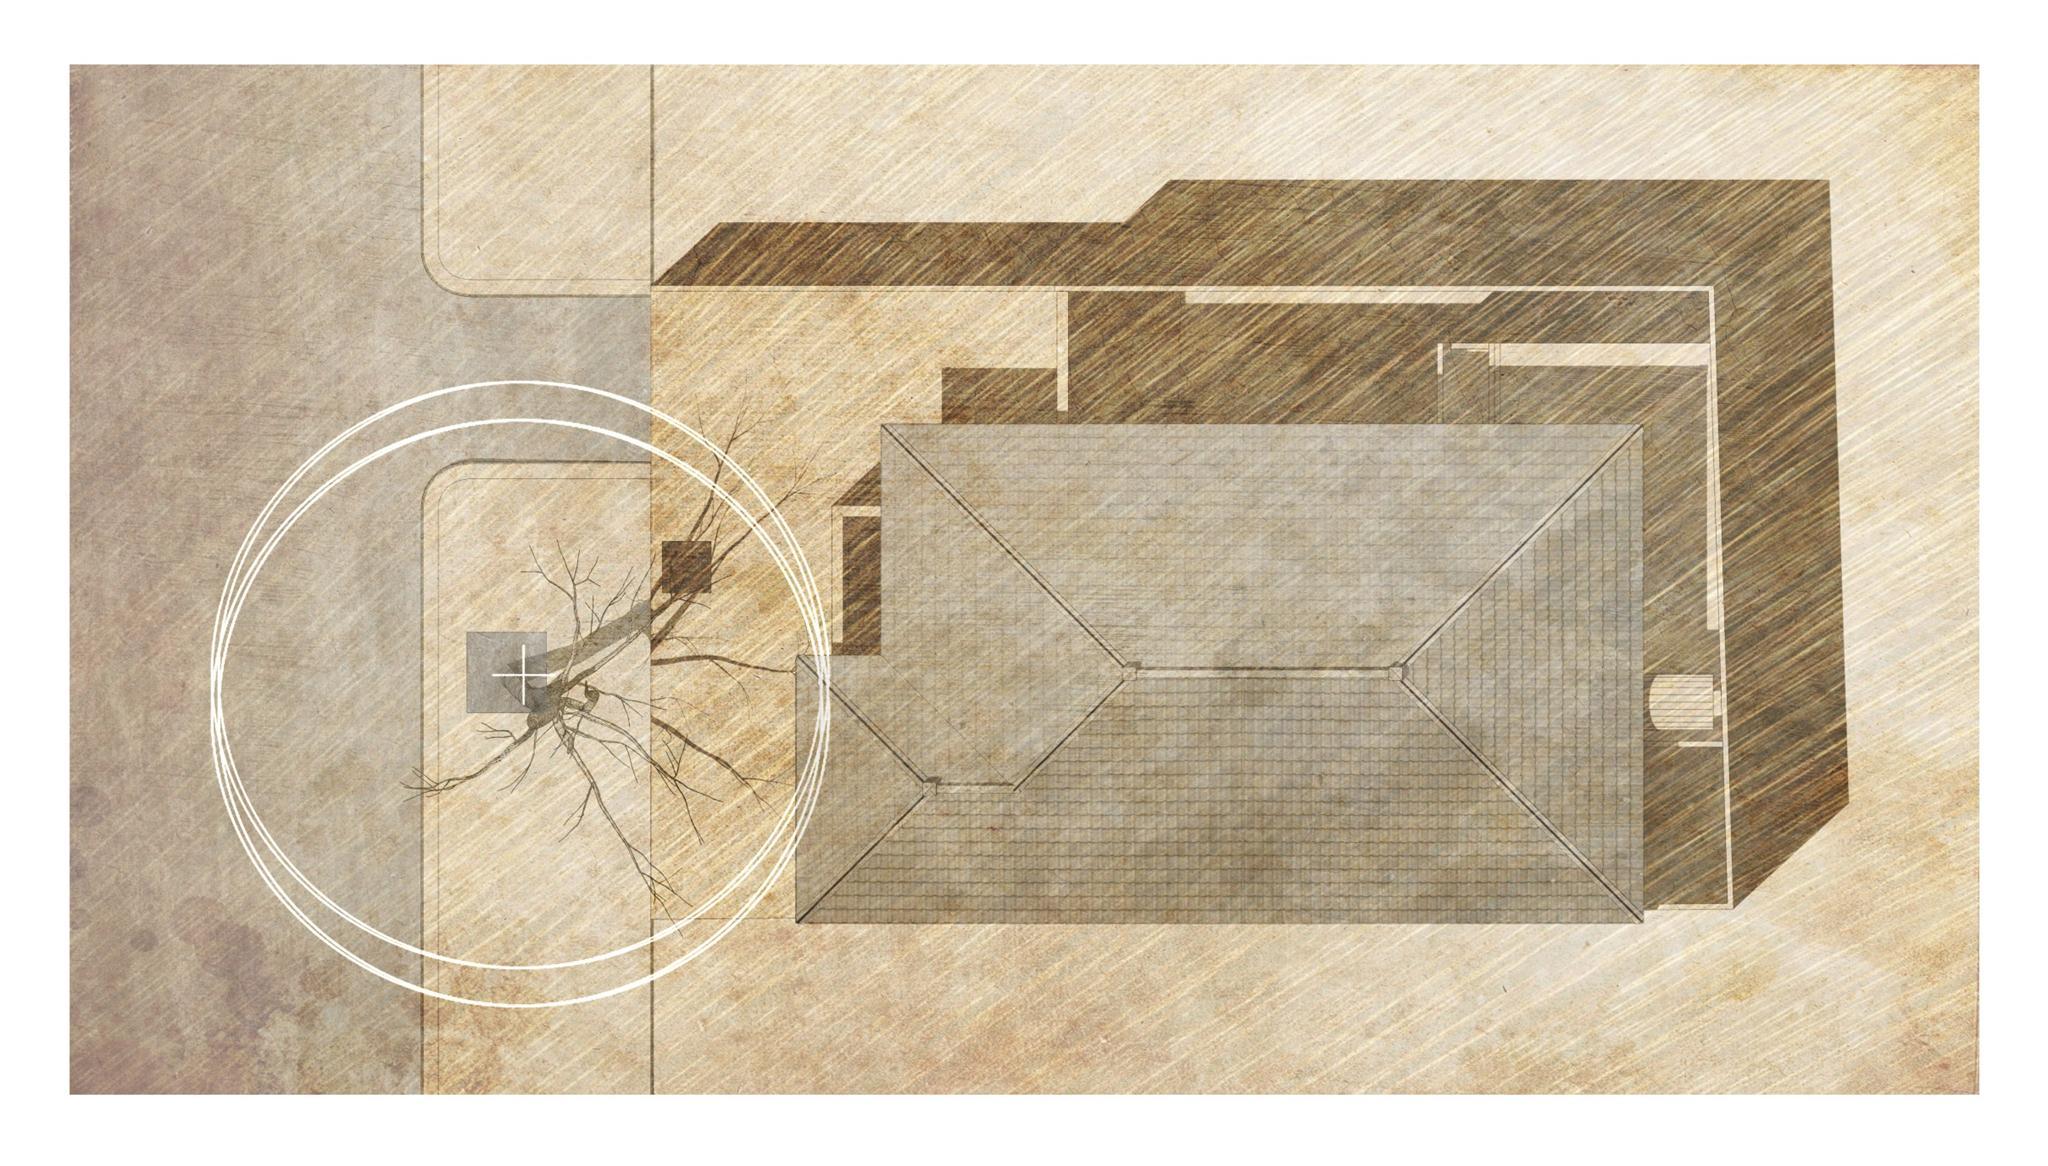 24-Geometrical-Diagram-Copy.jpg